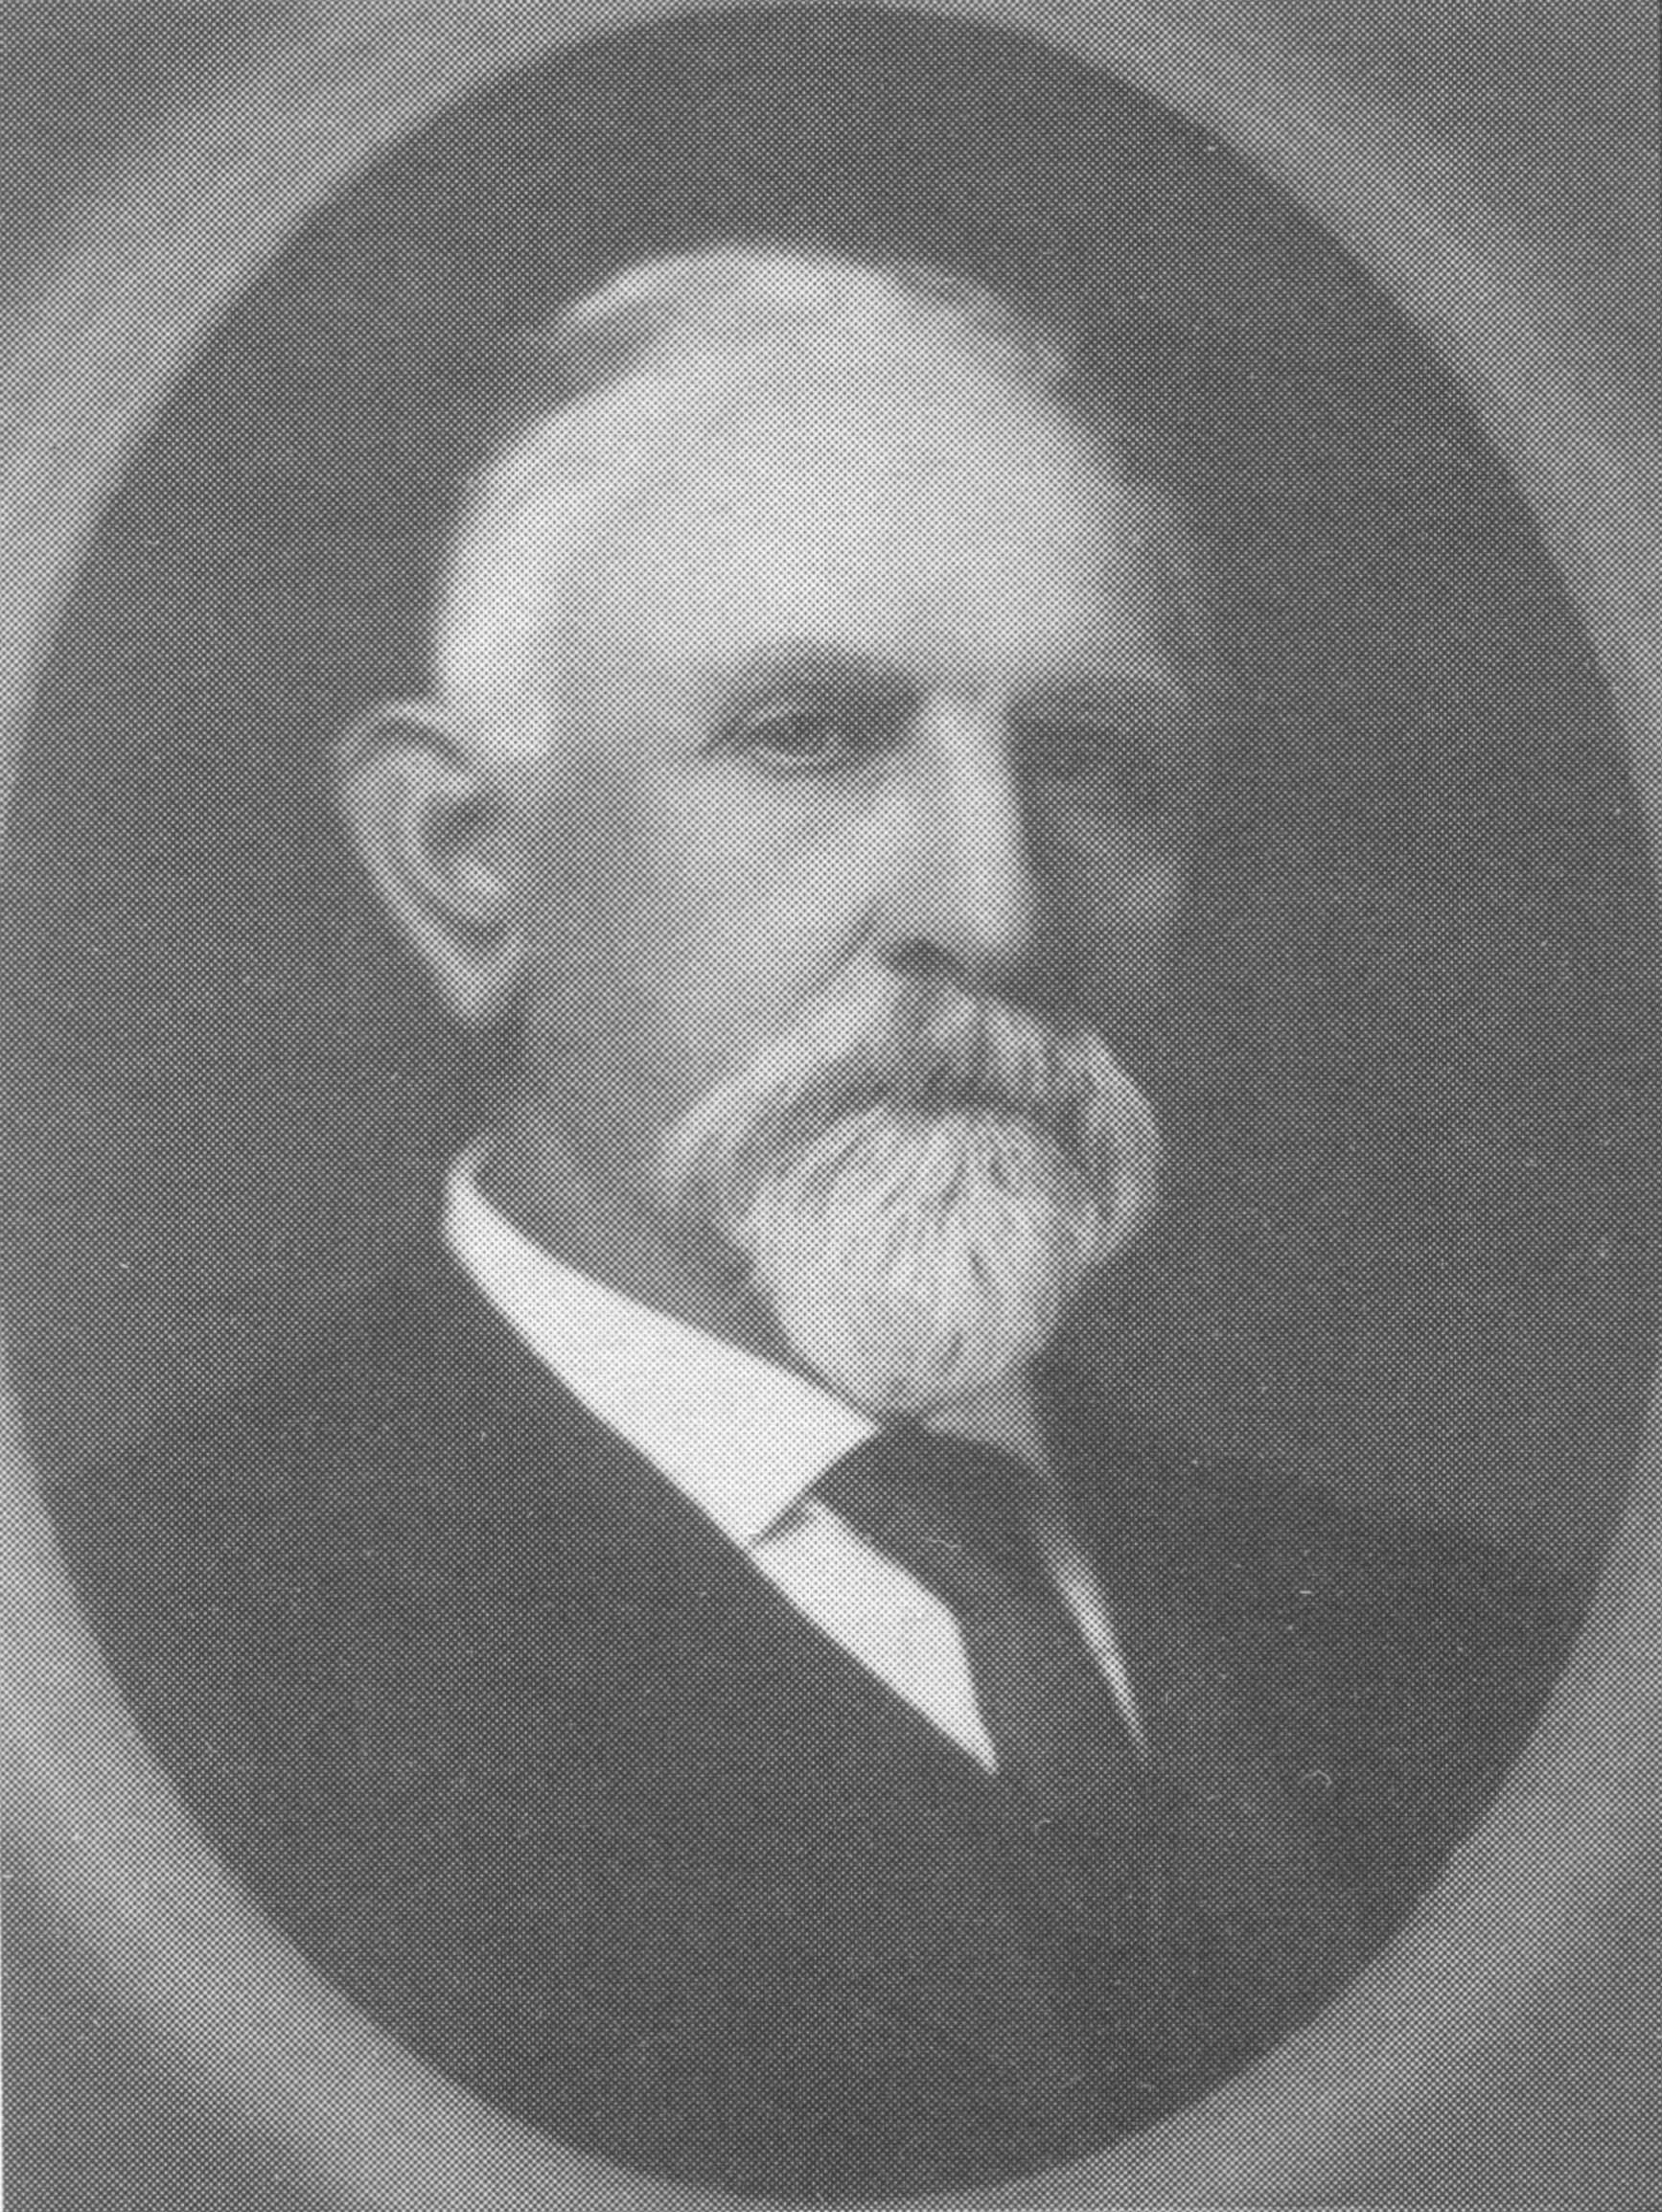 William Andrew (W.A.) Mauney